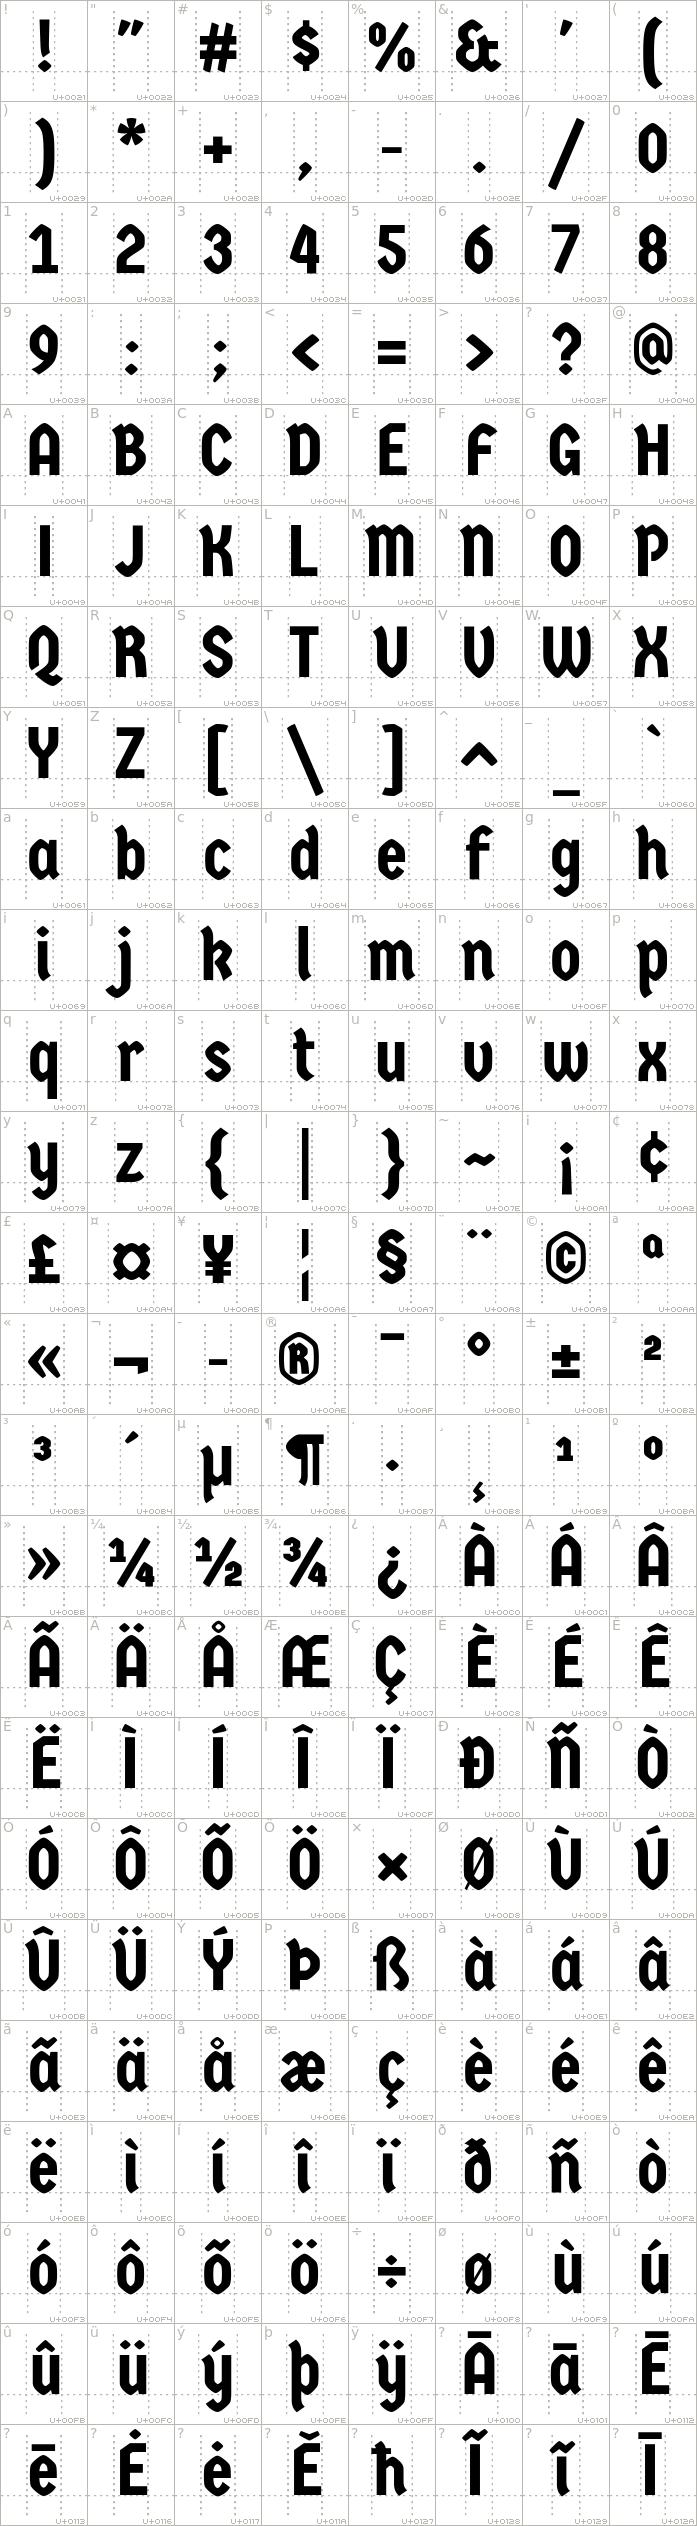 germania-one.regular.character-map-1